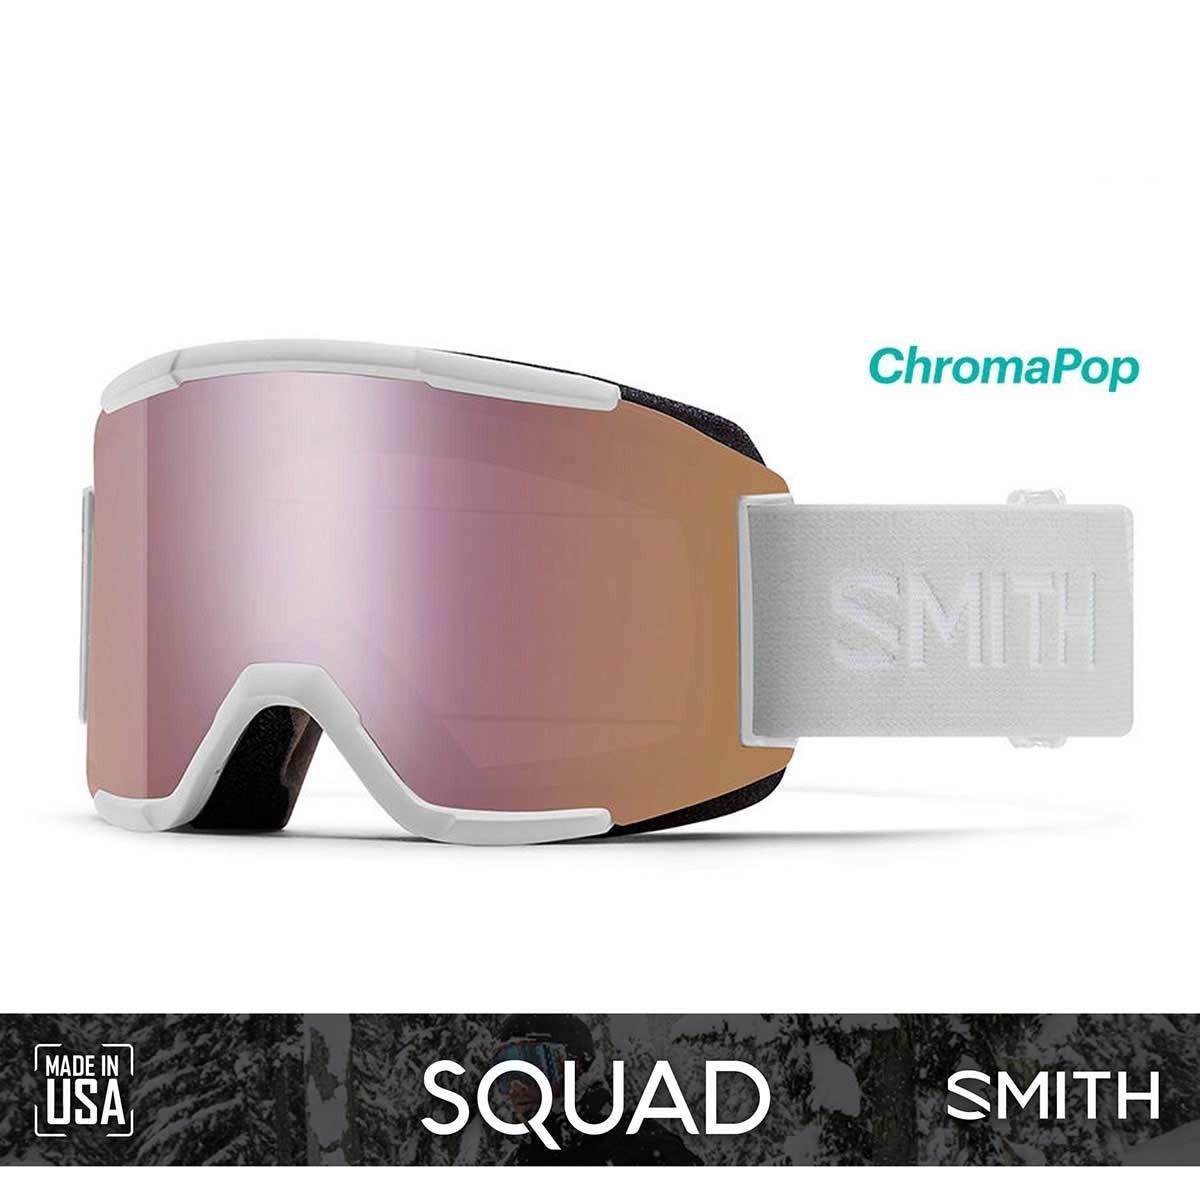 SMITH SQUAD White Vapor | S2-S1 CHROMAPOP Photochromic Rose Flash - Изображение - AQUAMATRIX